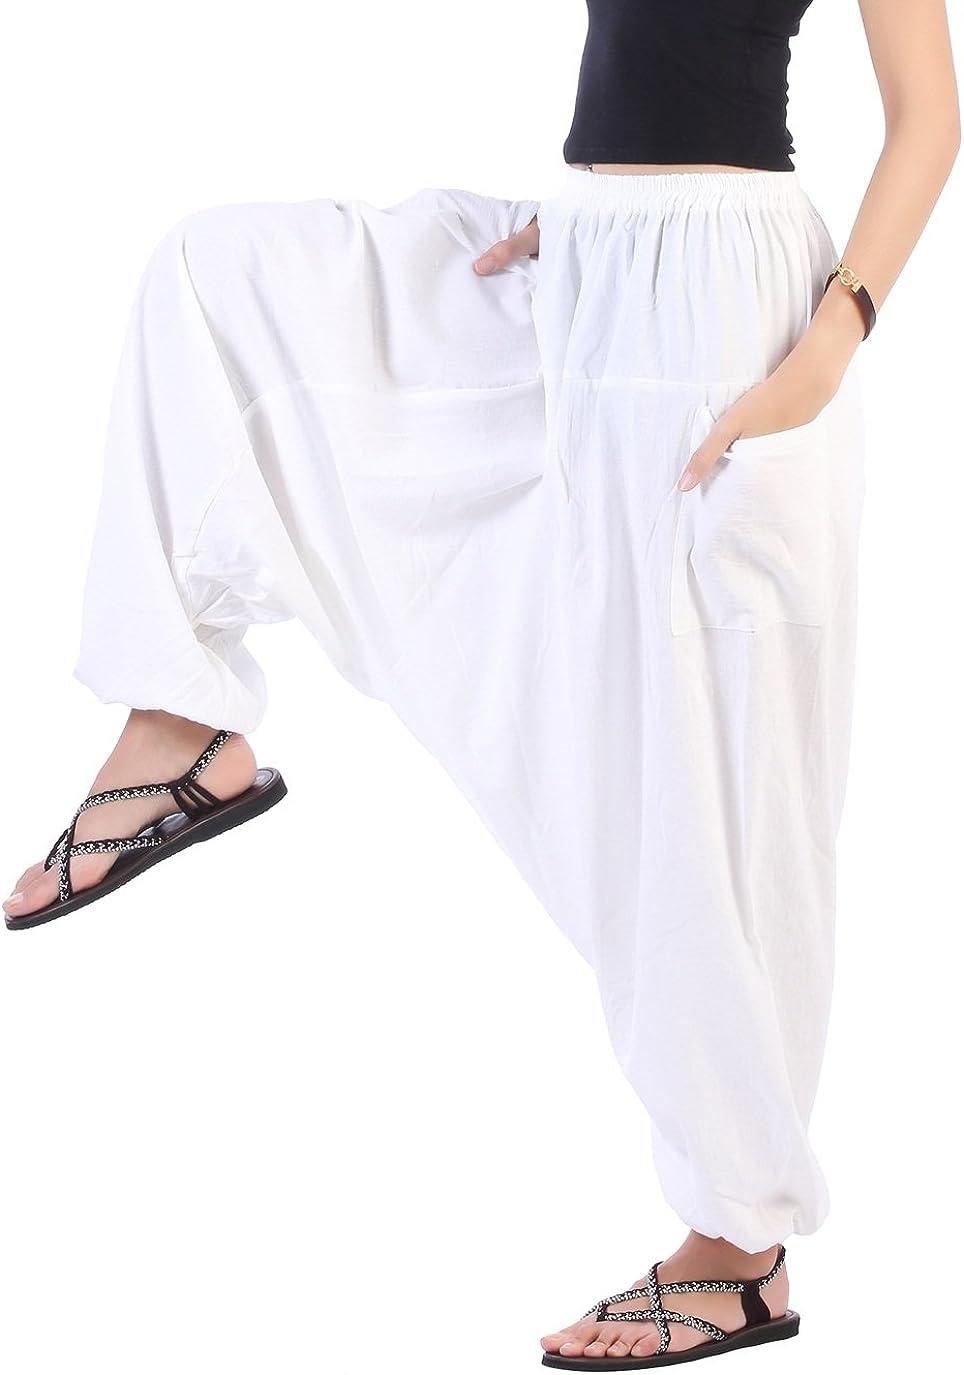 CandyHusky Men Women Cotton Baggy Hippie Boho Gypsy Aladdin Yoga Harem Pants